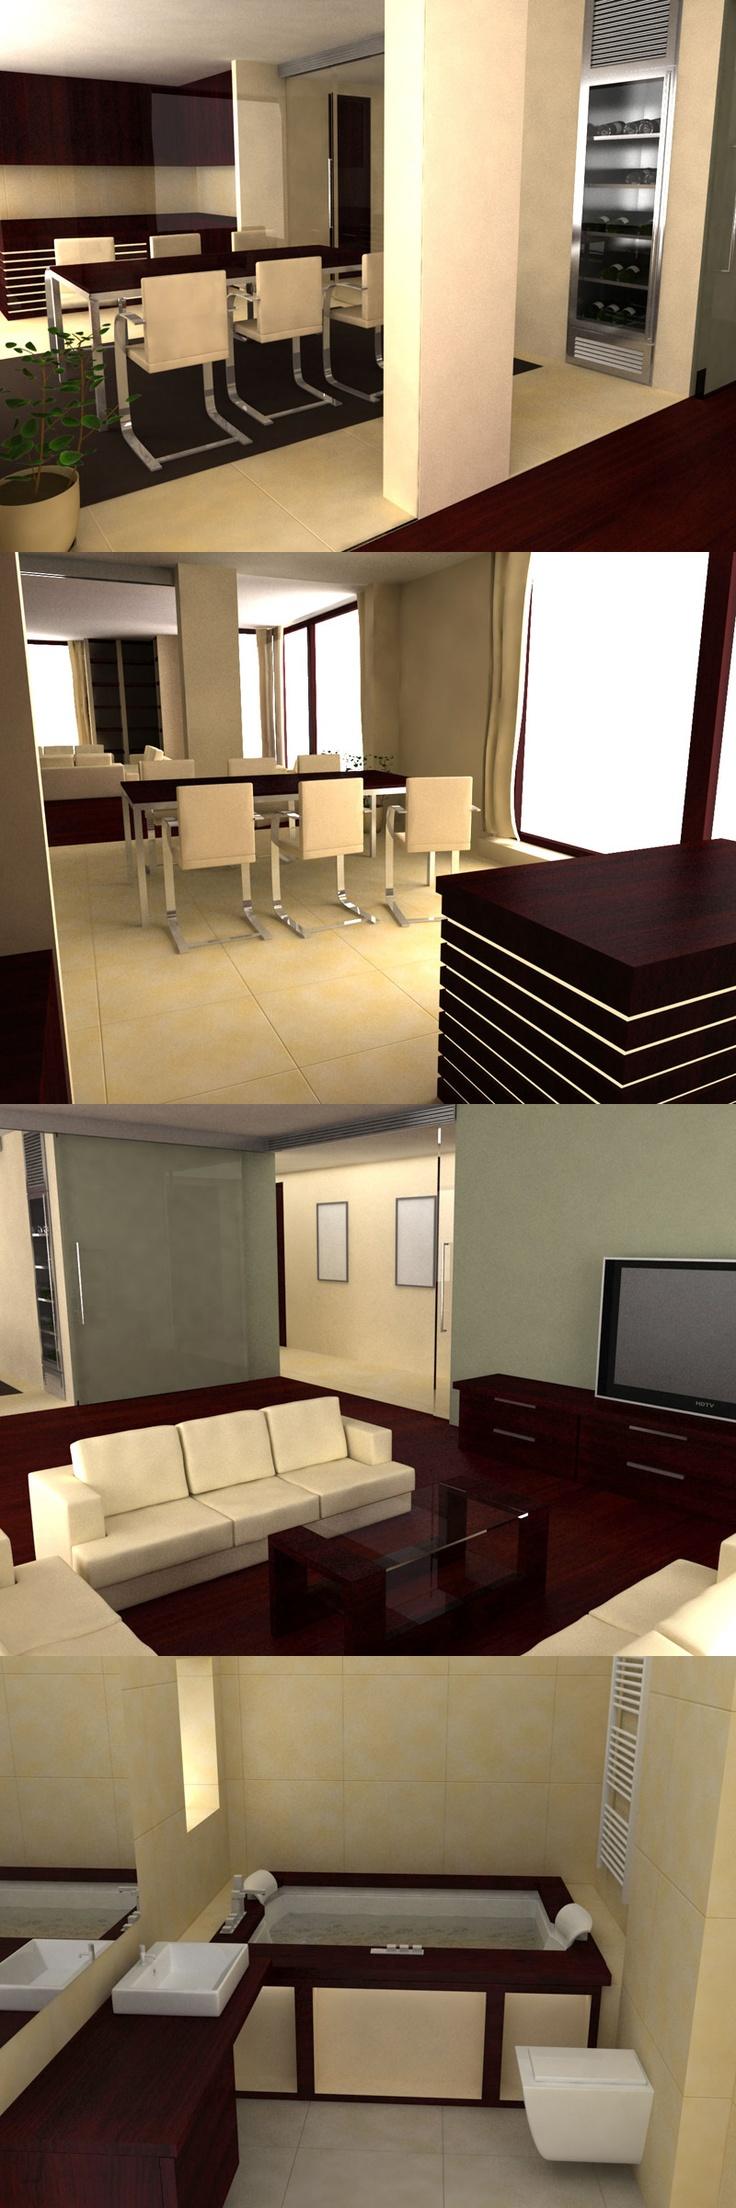 Architectonic visualisation of modern interior